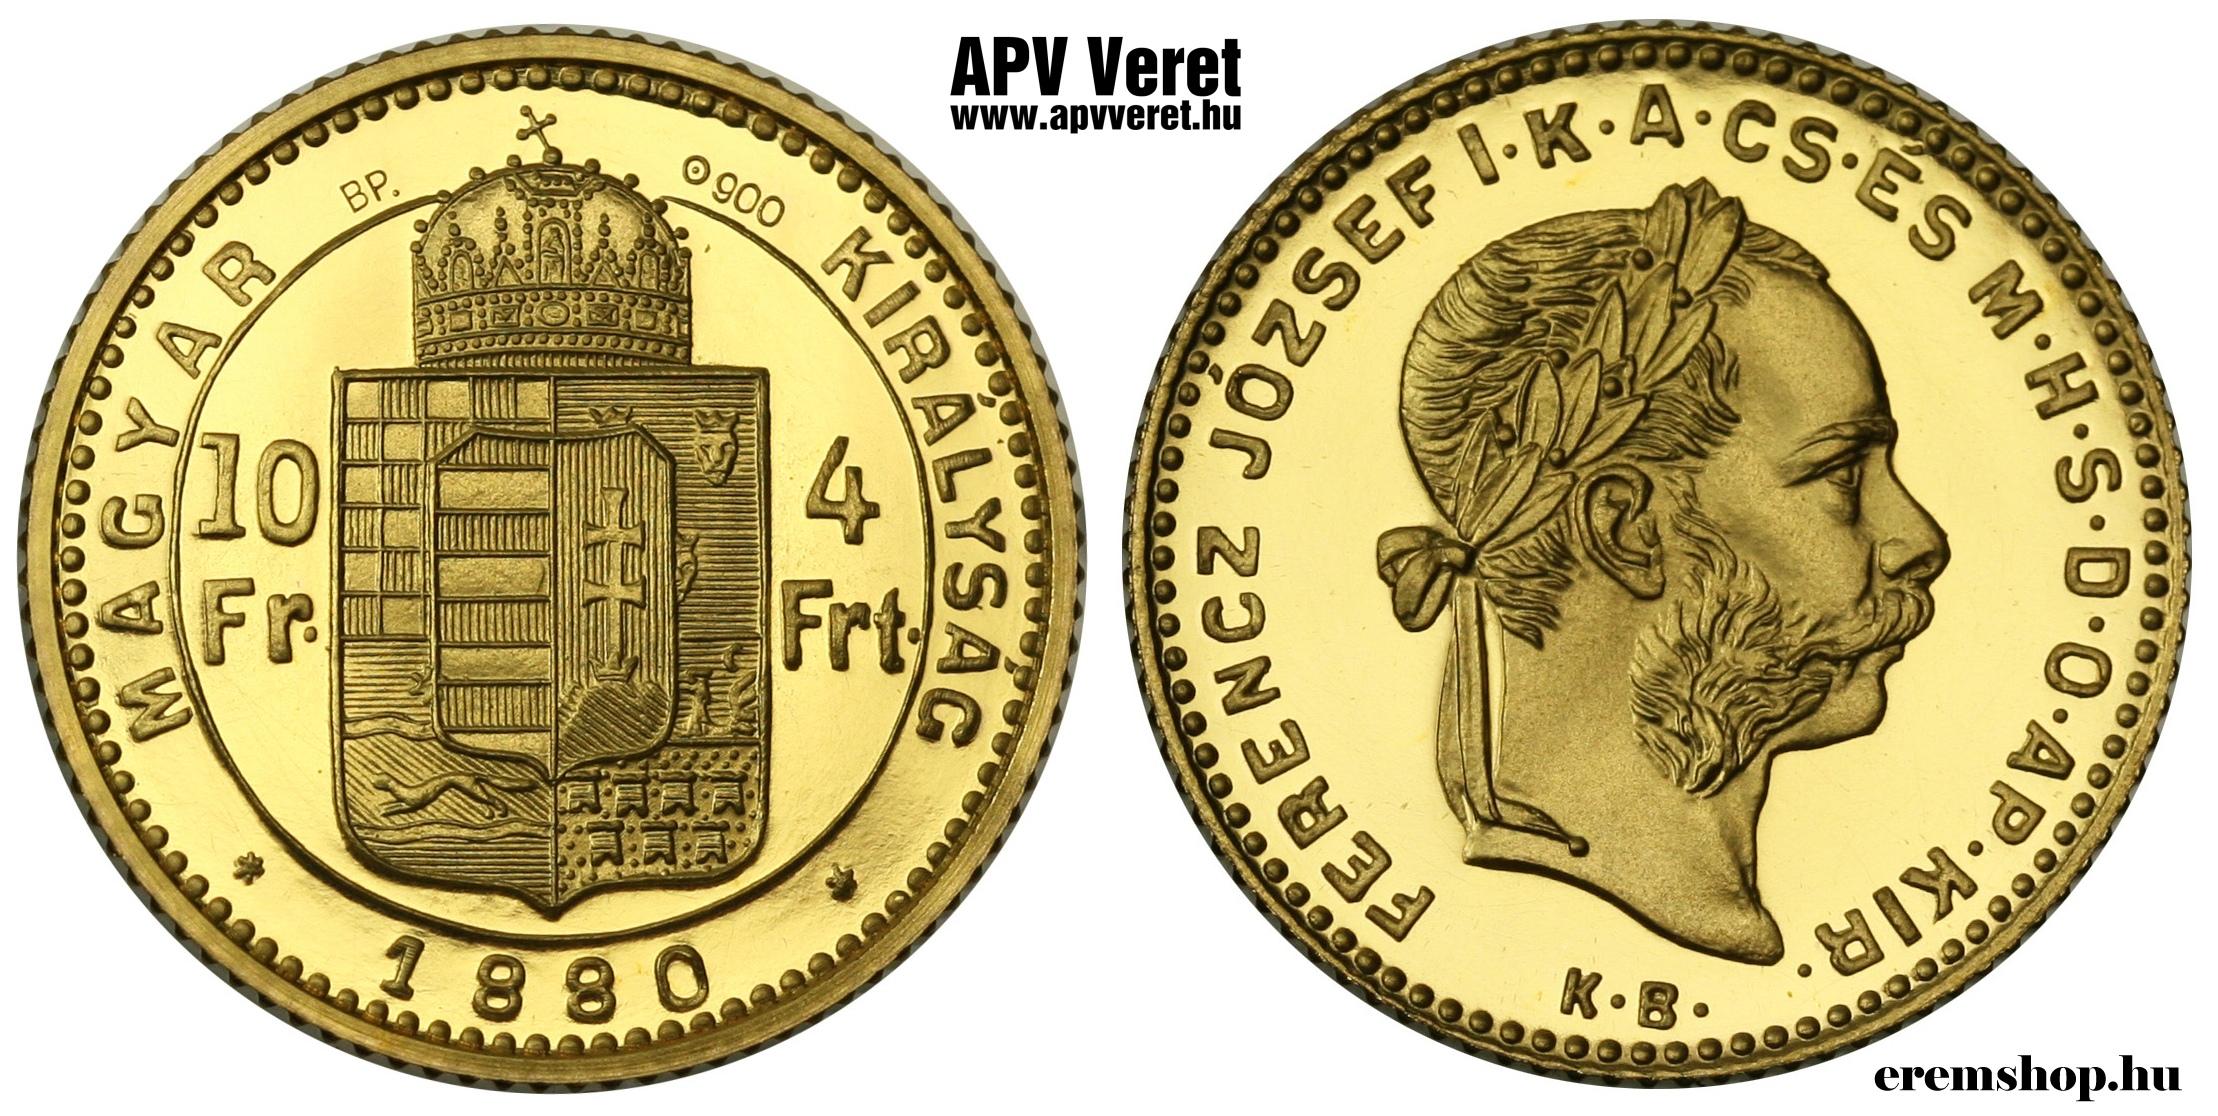 http://www.apvveret.hu/forint-krajcar-penzvero-utanveret/www_apvveret_hu_arany_jelolt_1880_4-forint-10-frank_penzvero-utanveret.jpg